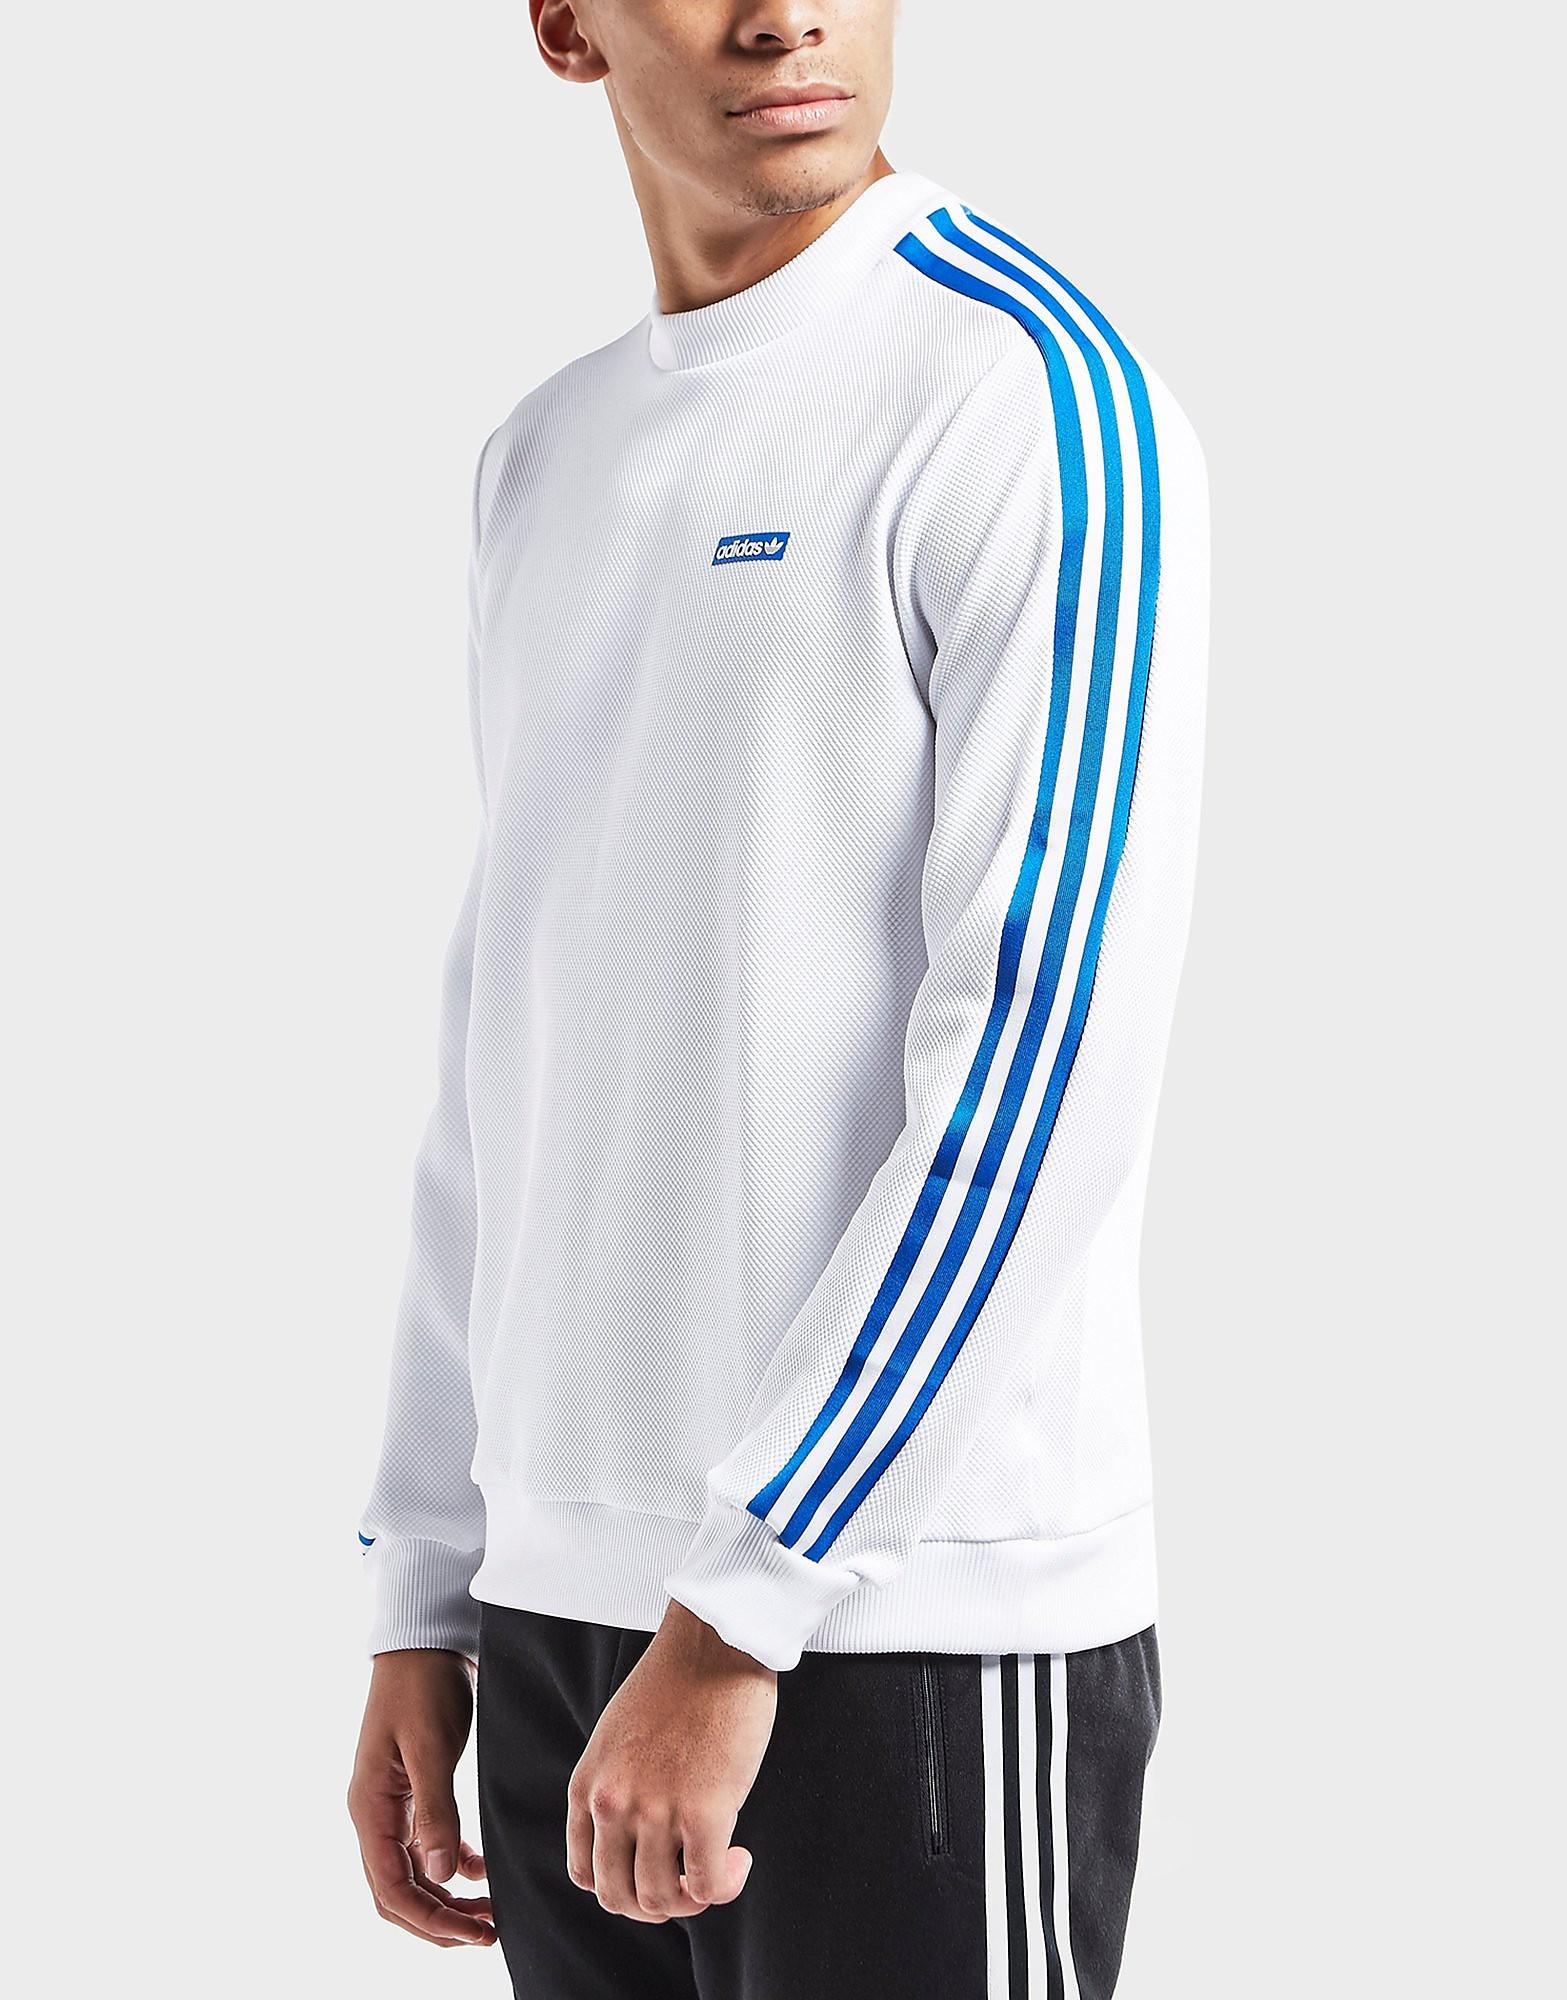 adidas Originals Tennoji Crew Sweatshirt